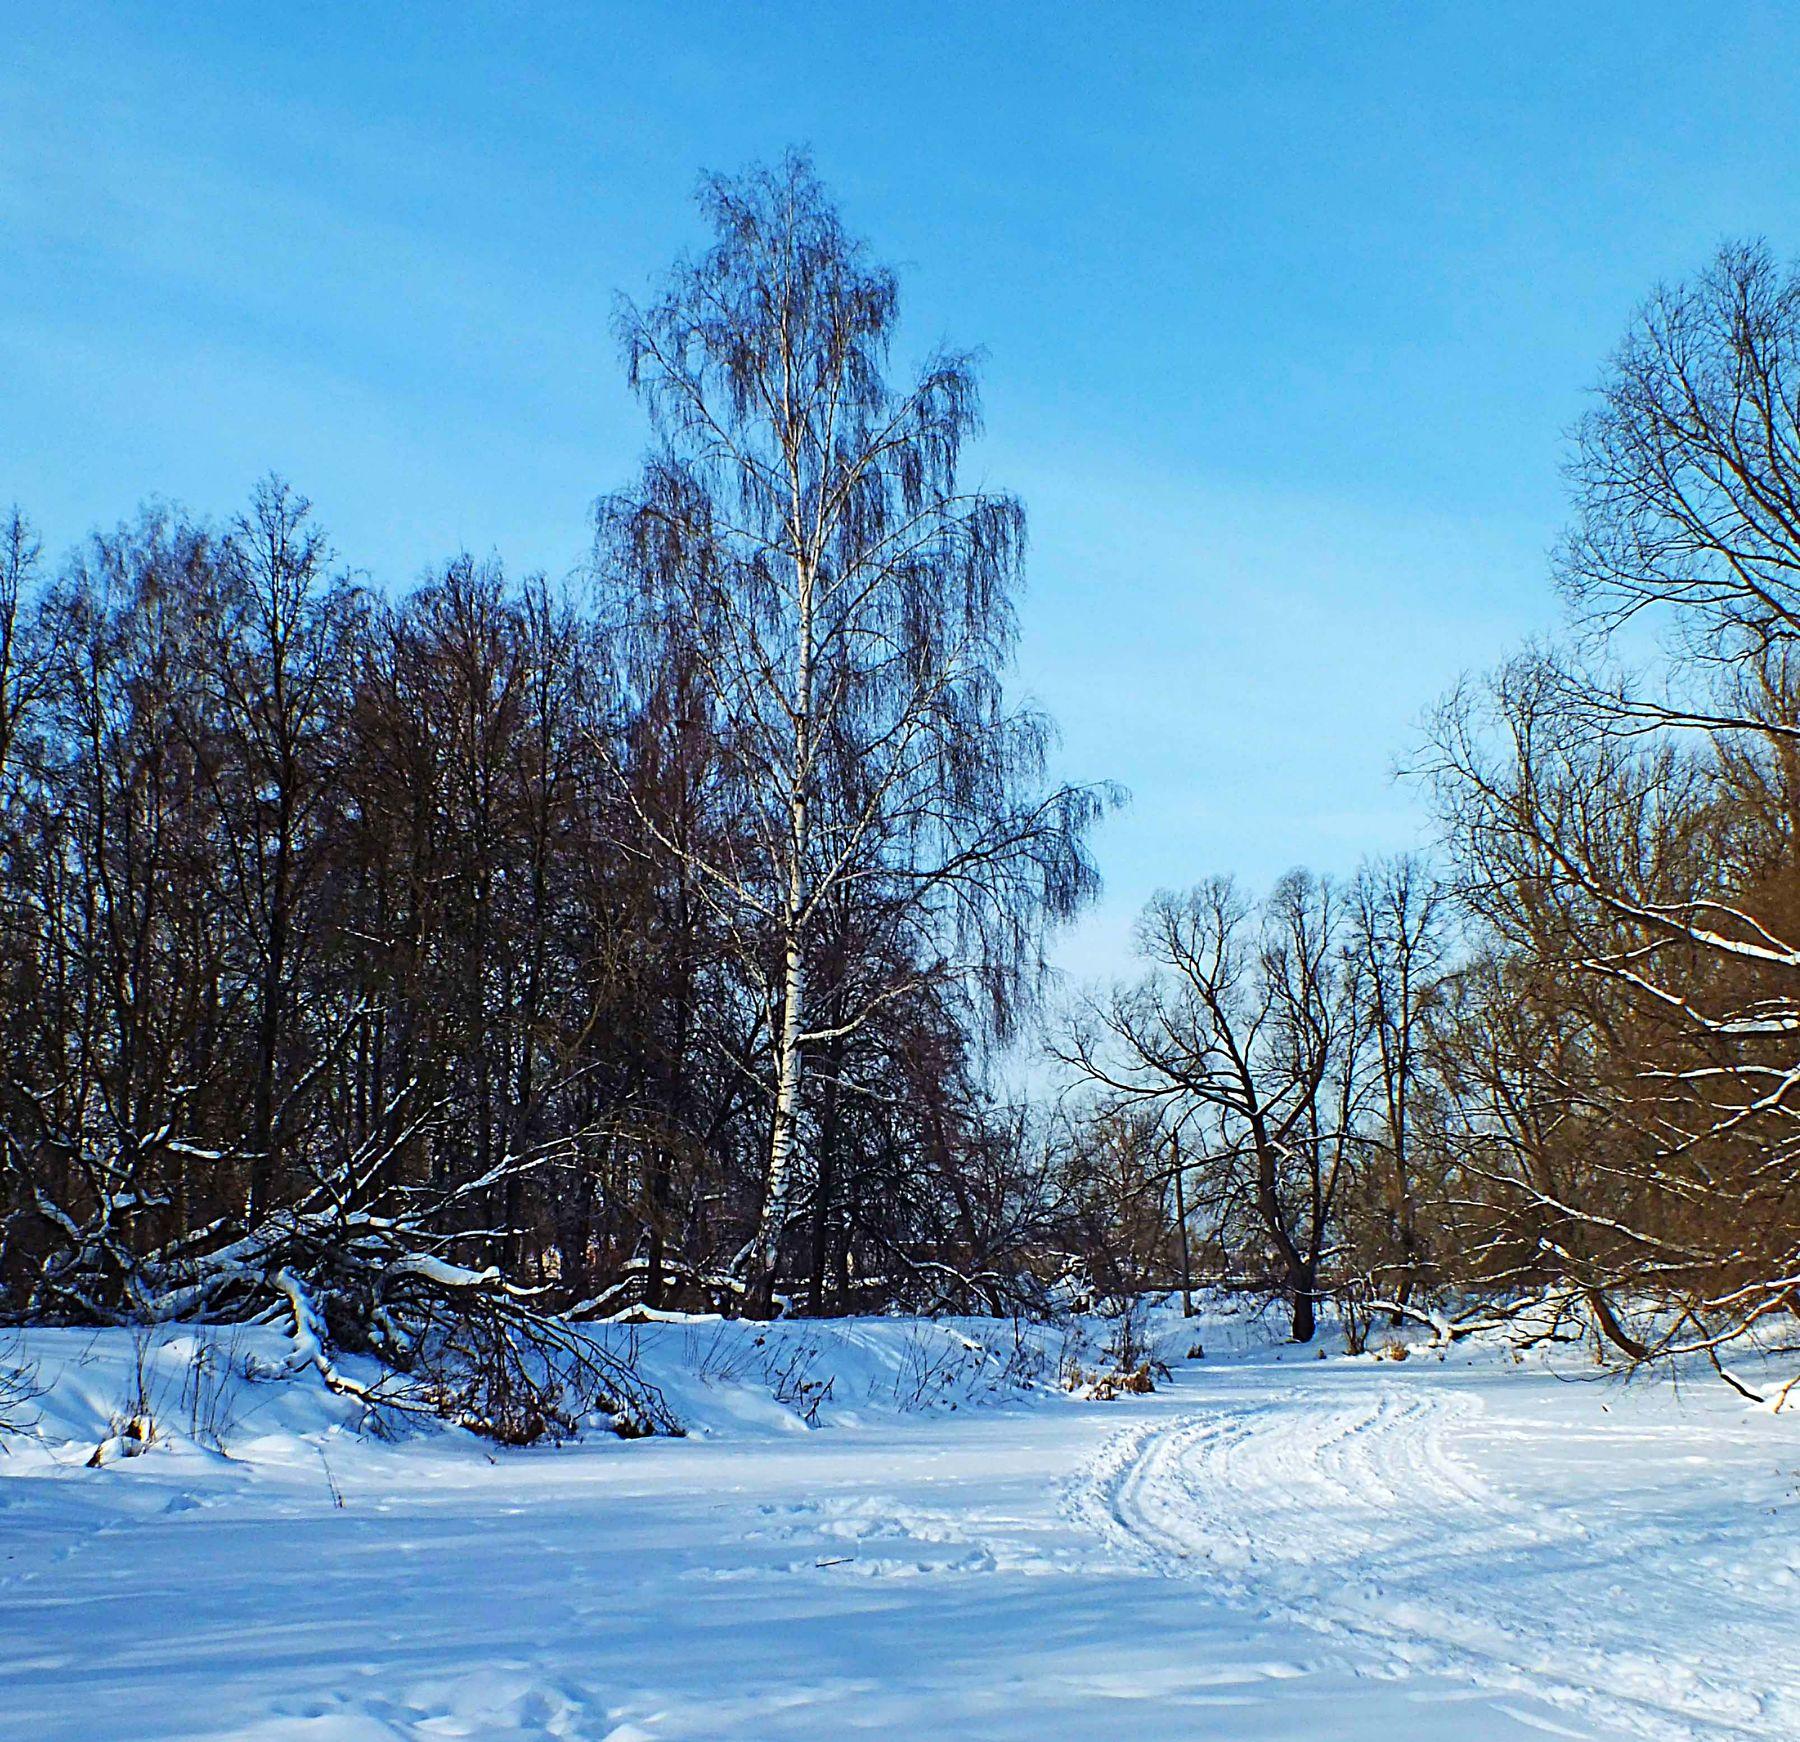 Зимнее безмолствие зима снег мороз